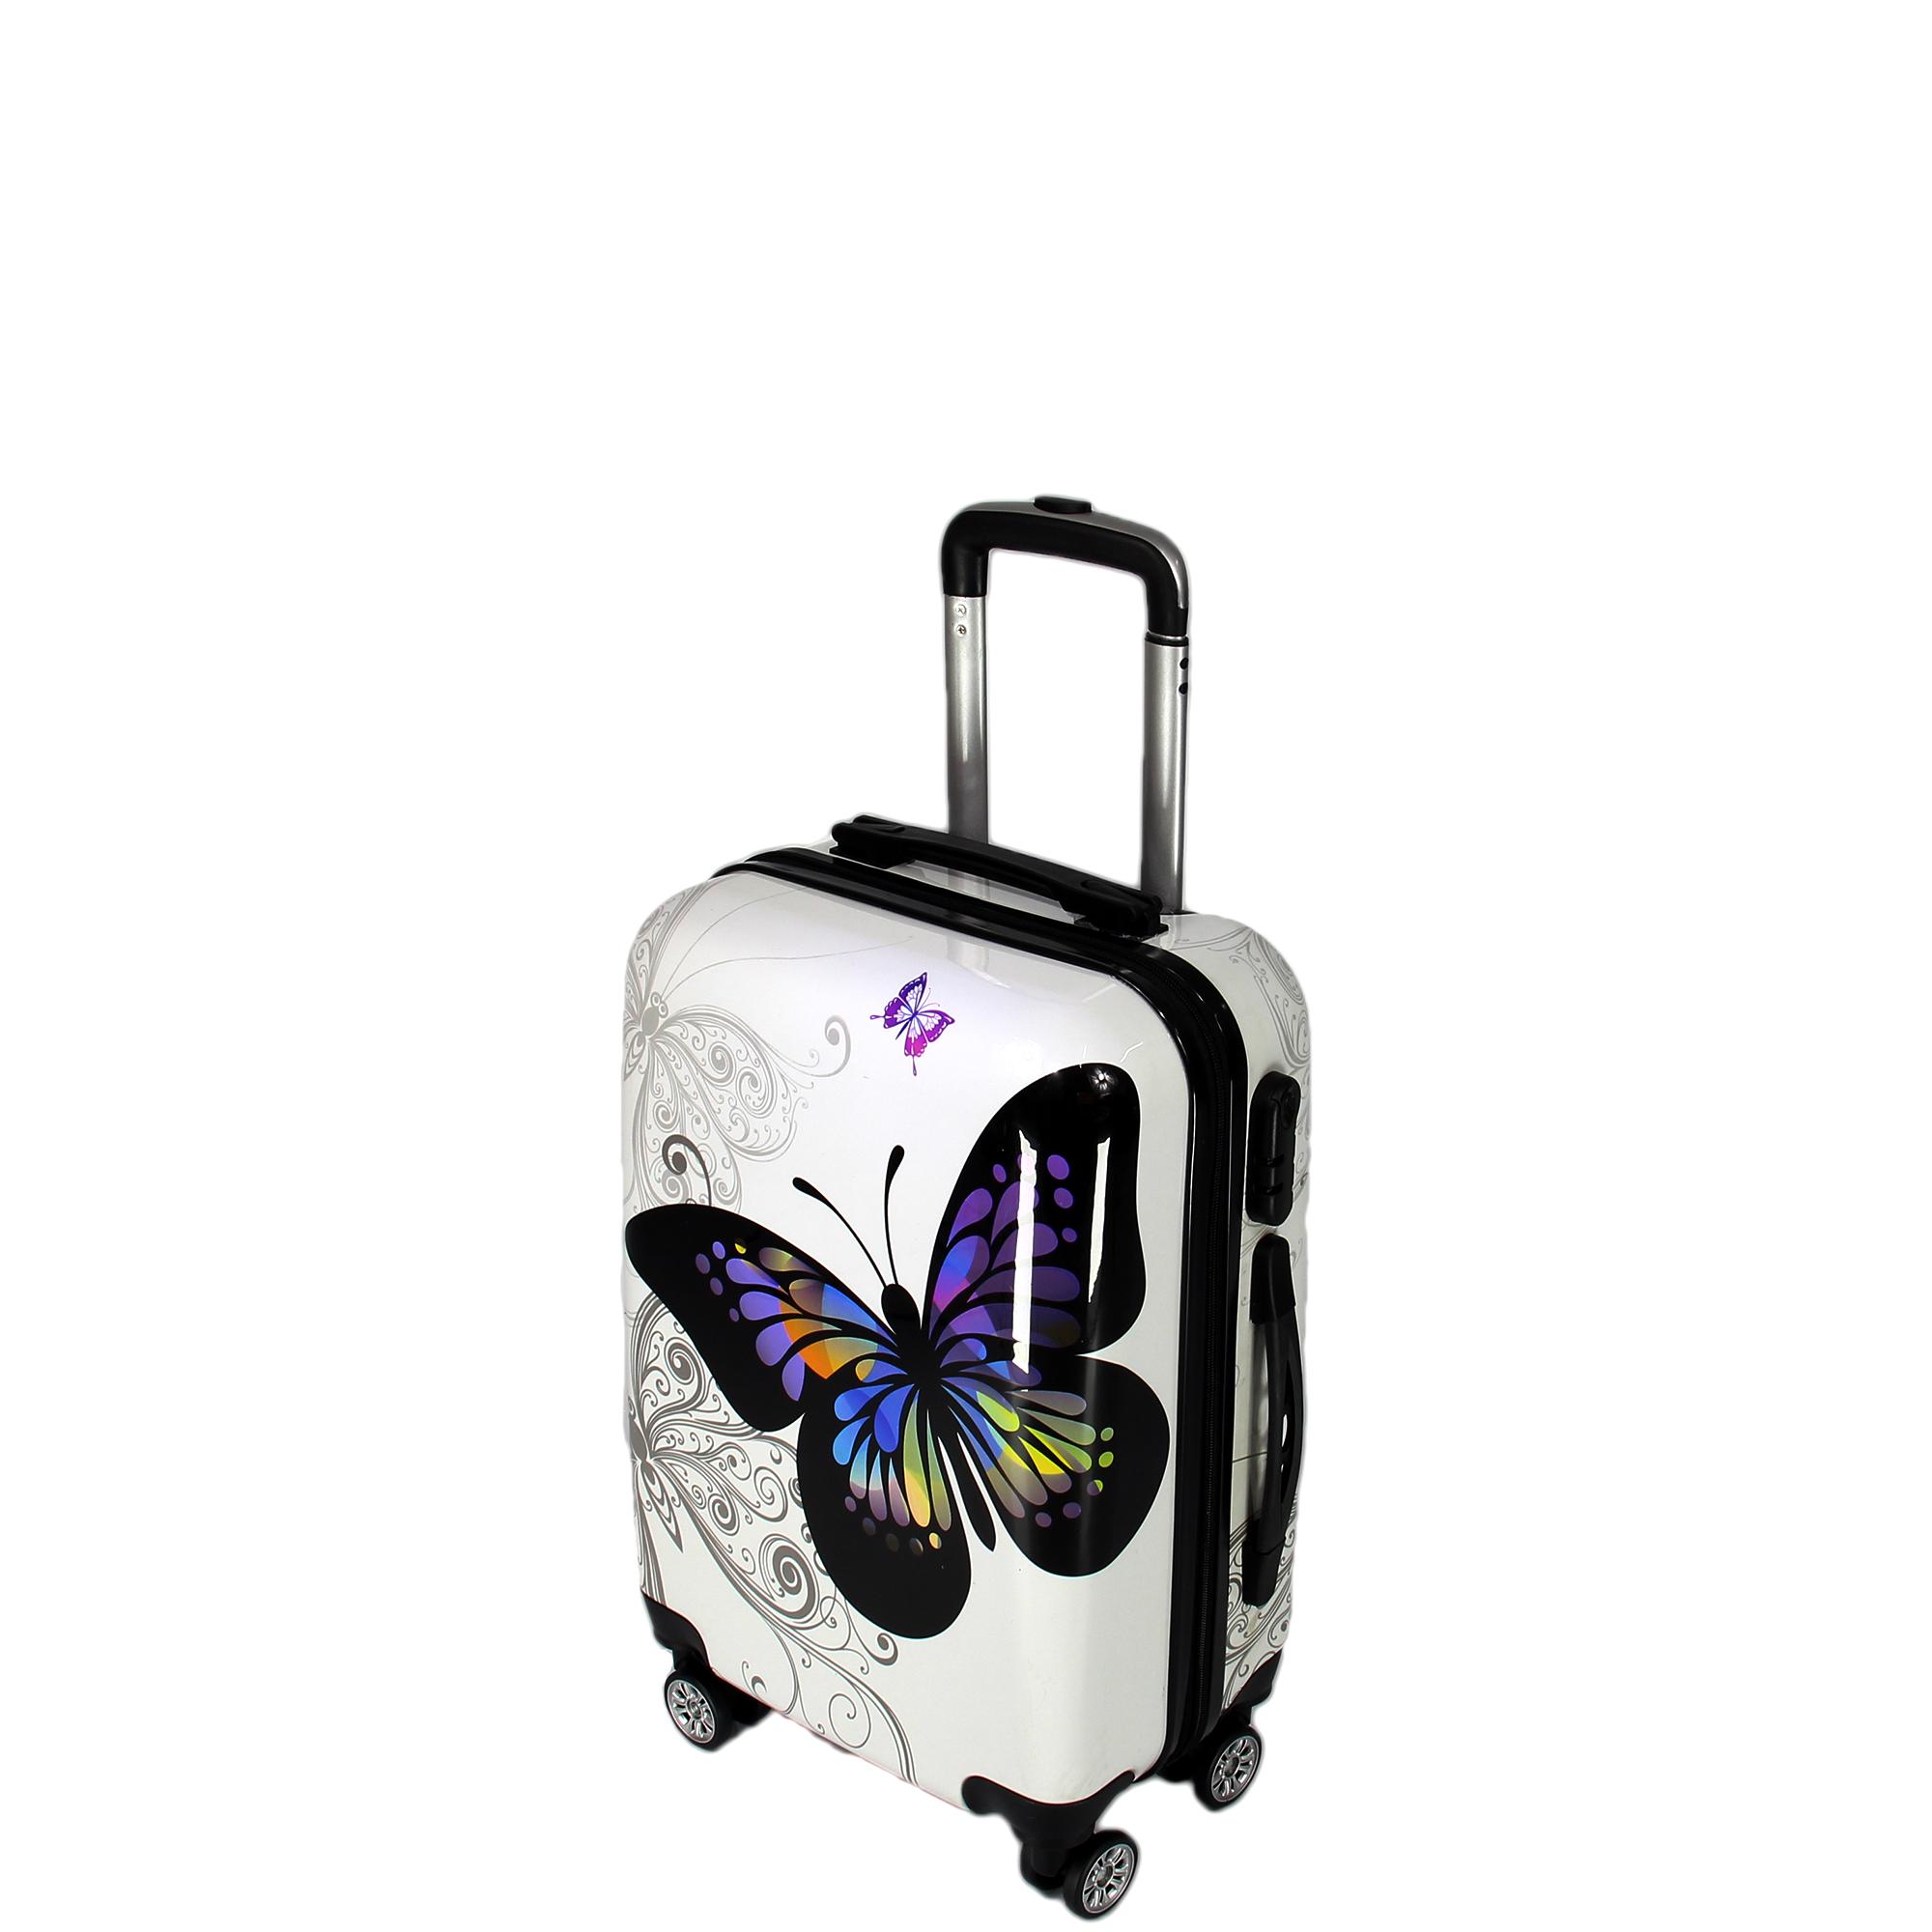 bagages ensemble valise de voyage papillon angleterre. Black Bedroom Furniture Sets. Home Design Ideas